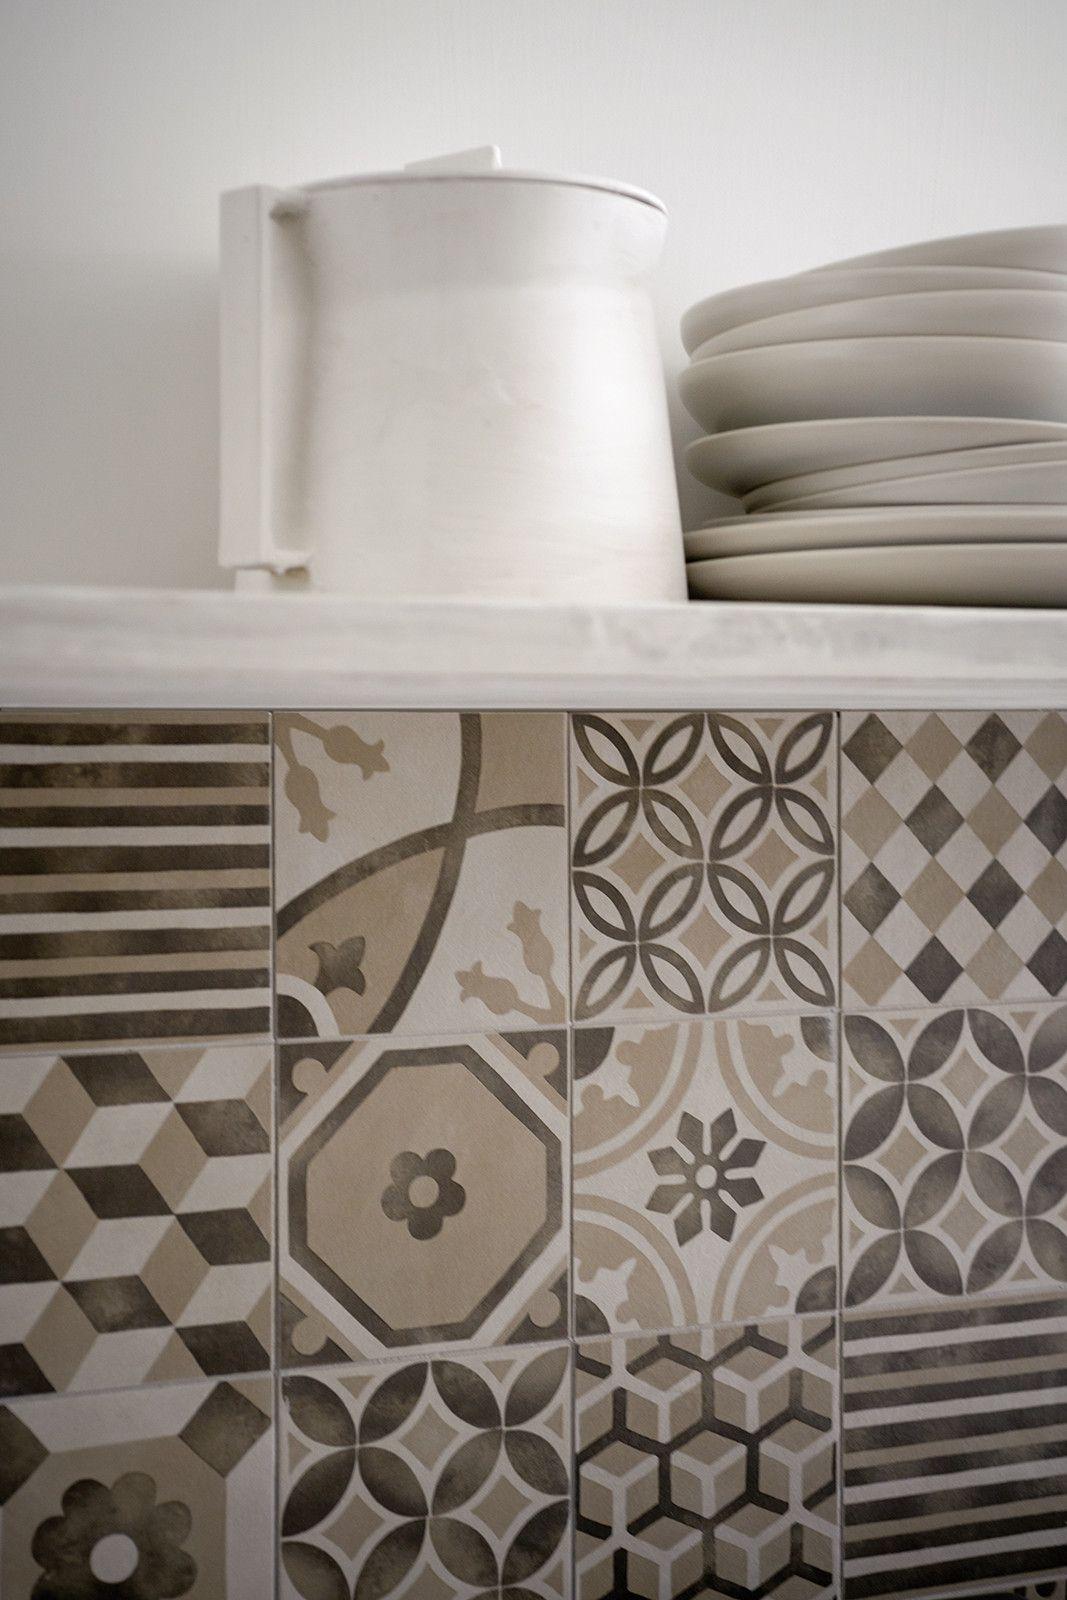 Marazzi #Block Decoro Naturale Beige 15x15 cm MH92 | #Gres #decorati ...